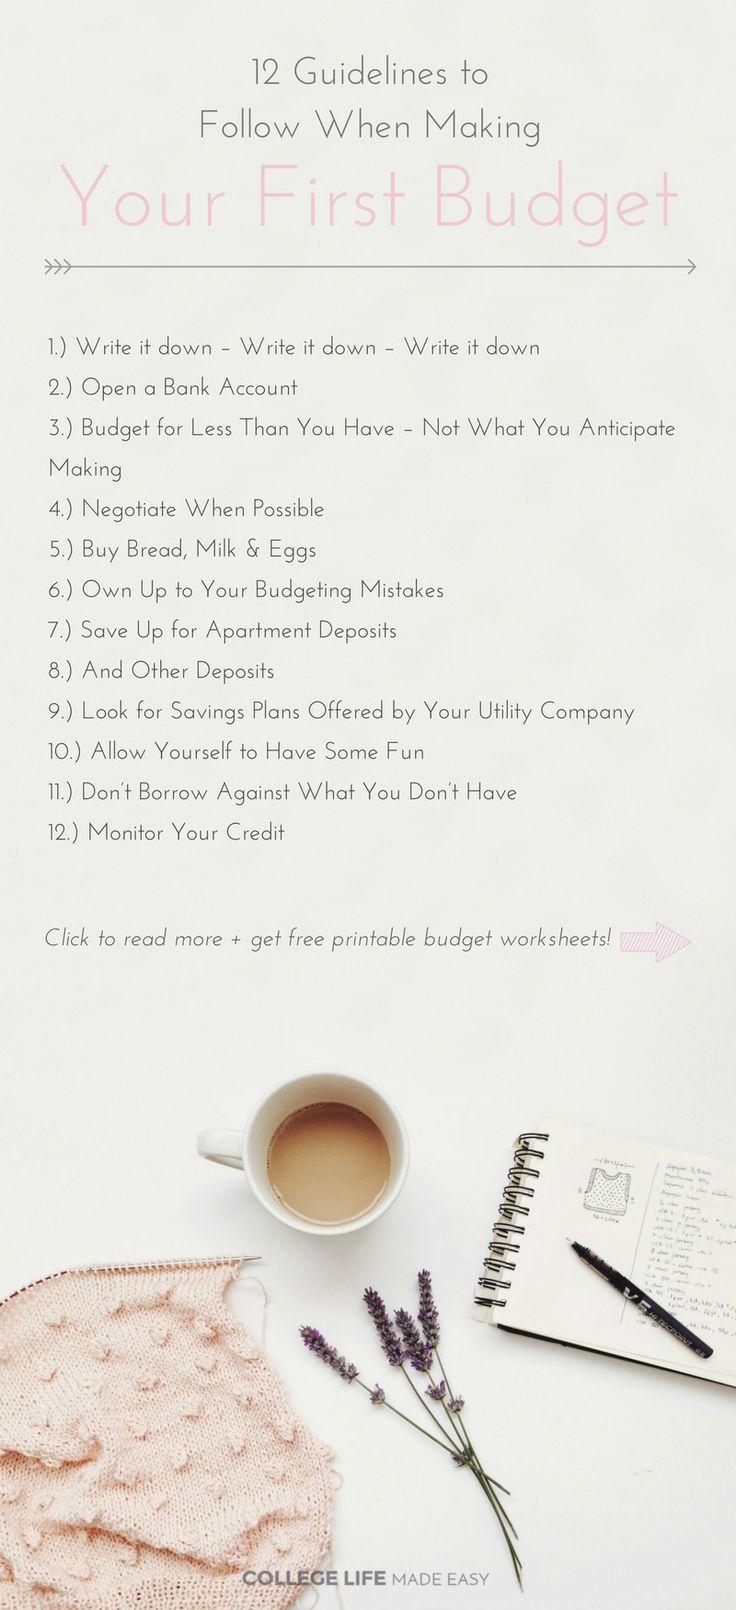 Budgeting worksheets for students uk